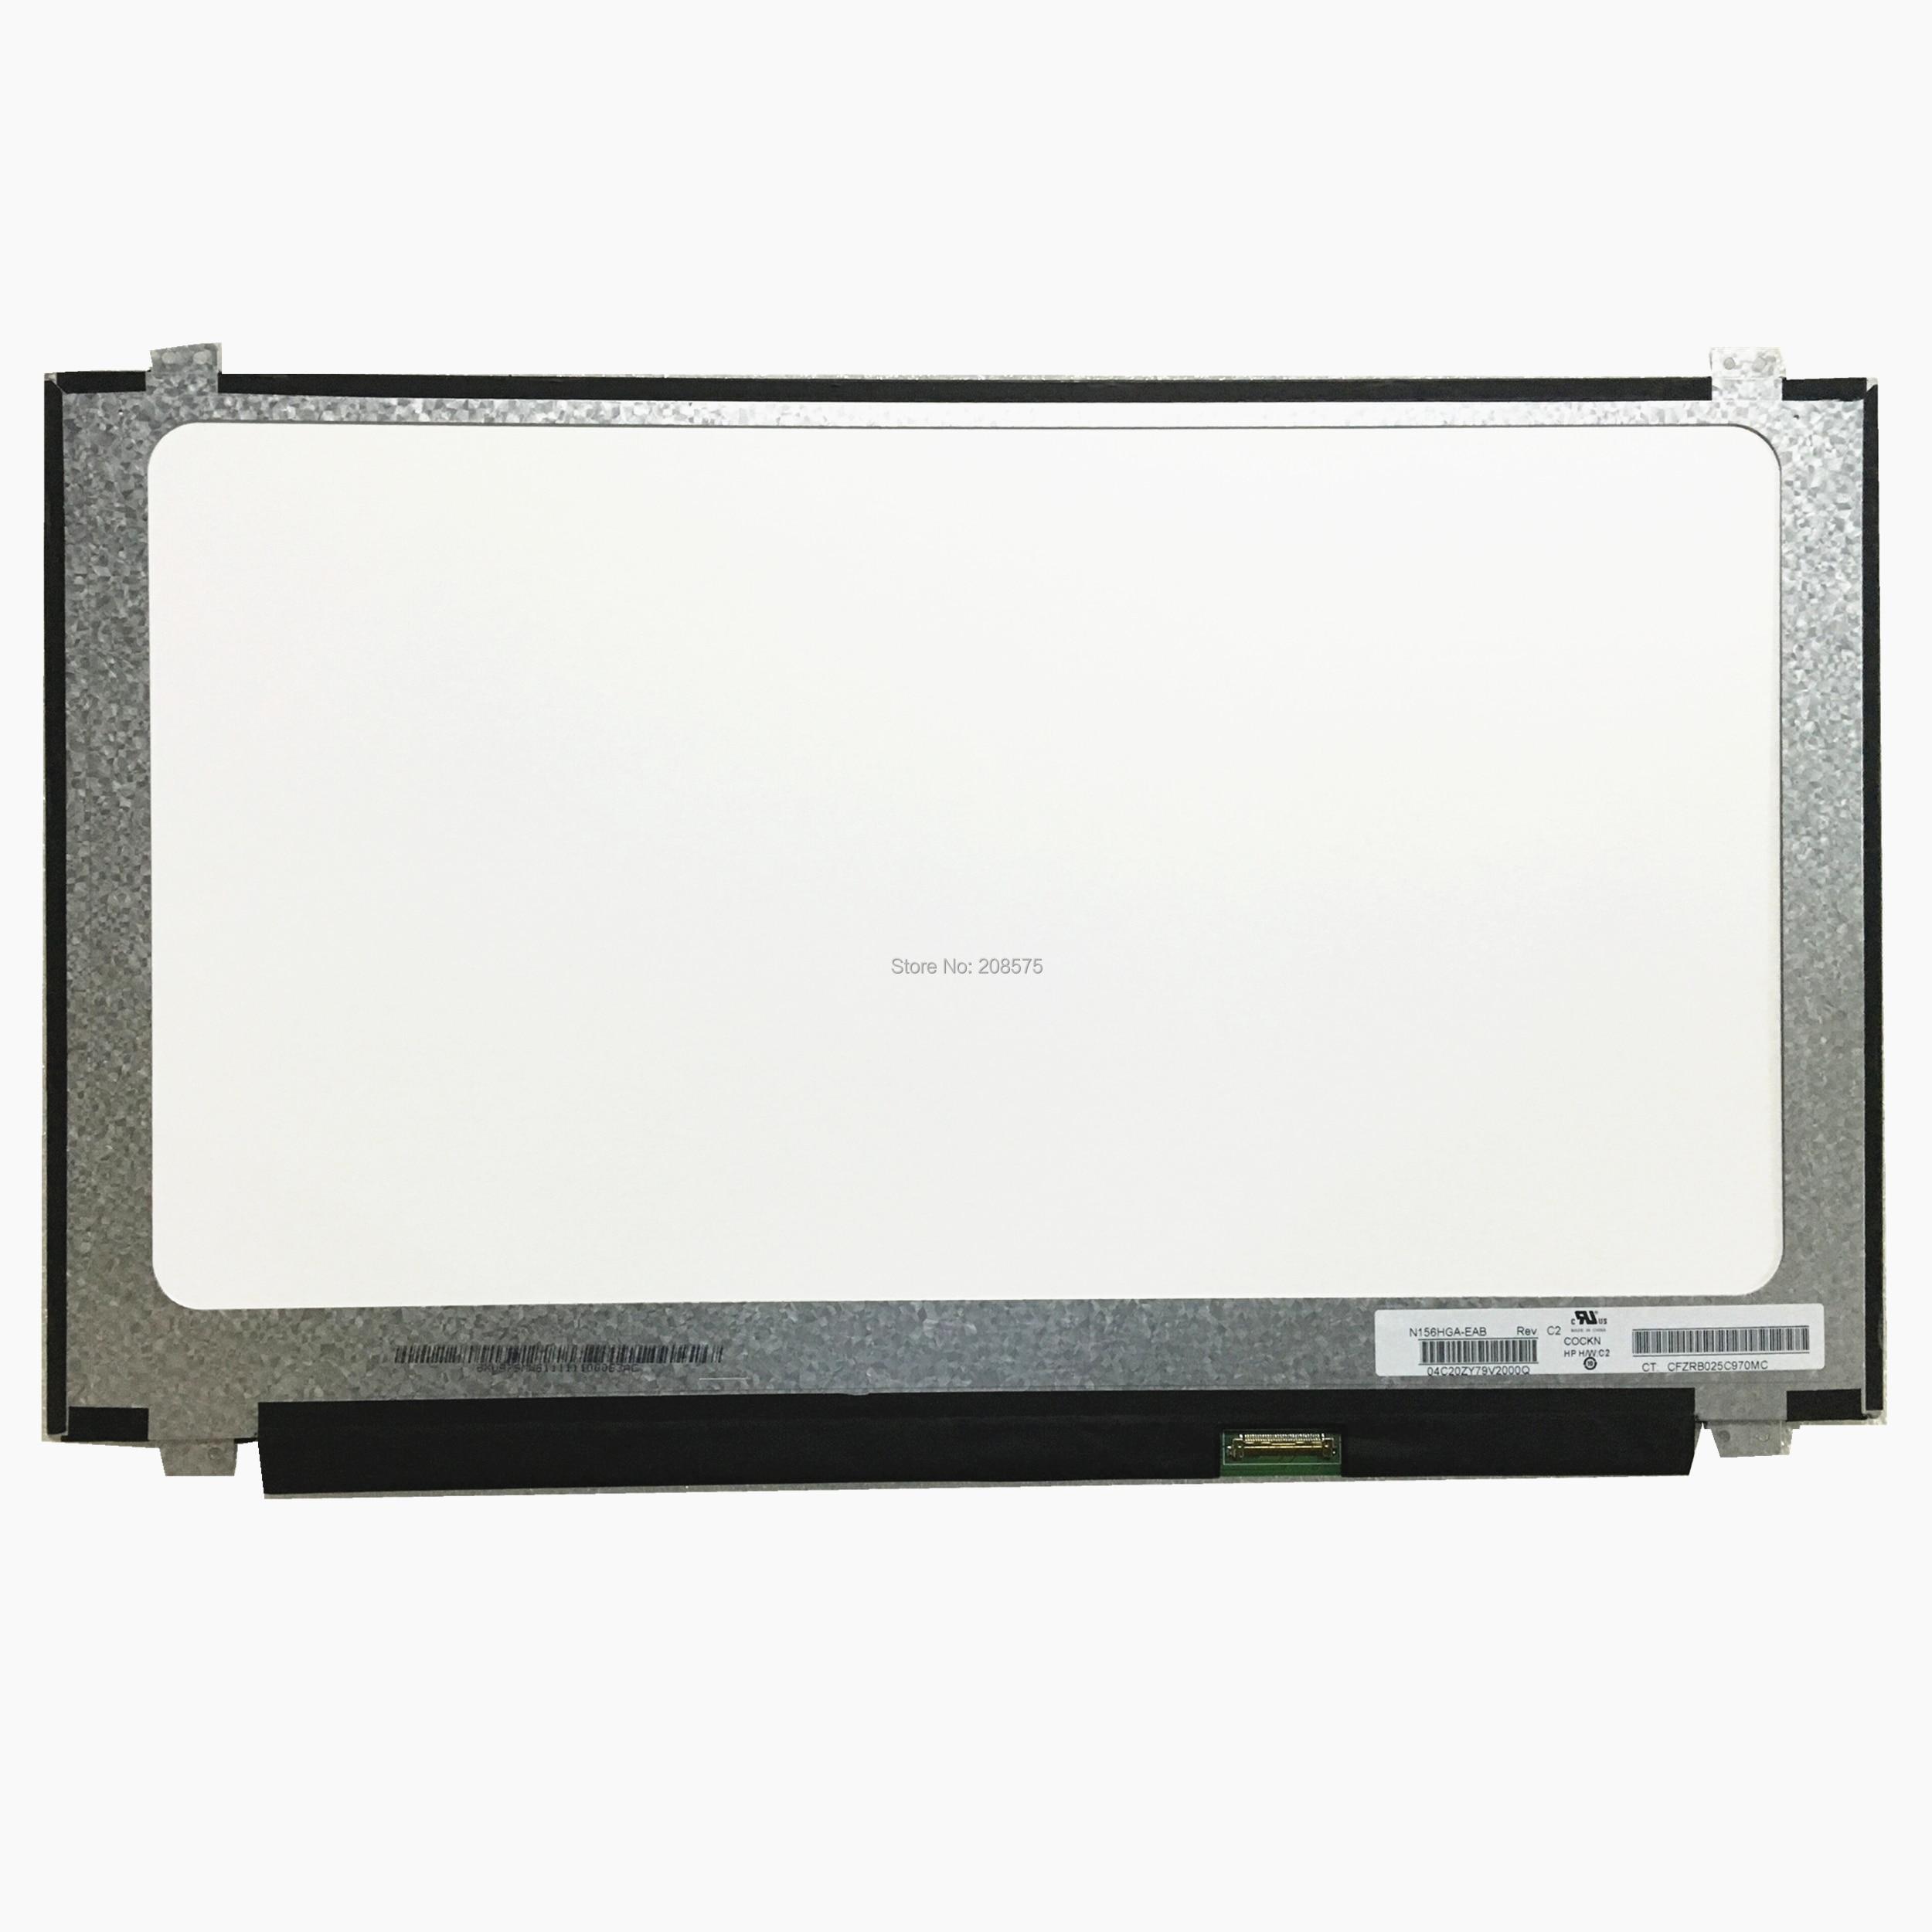 Frete grátis N156HGA-EAB N156HGE EAB N156HGE VAZANTE N156HGE EAL N156HGE-EA1 EA2 EB1 Laptop tela lcd 1920*1080 30pin EDP